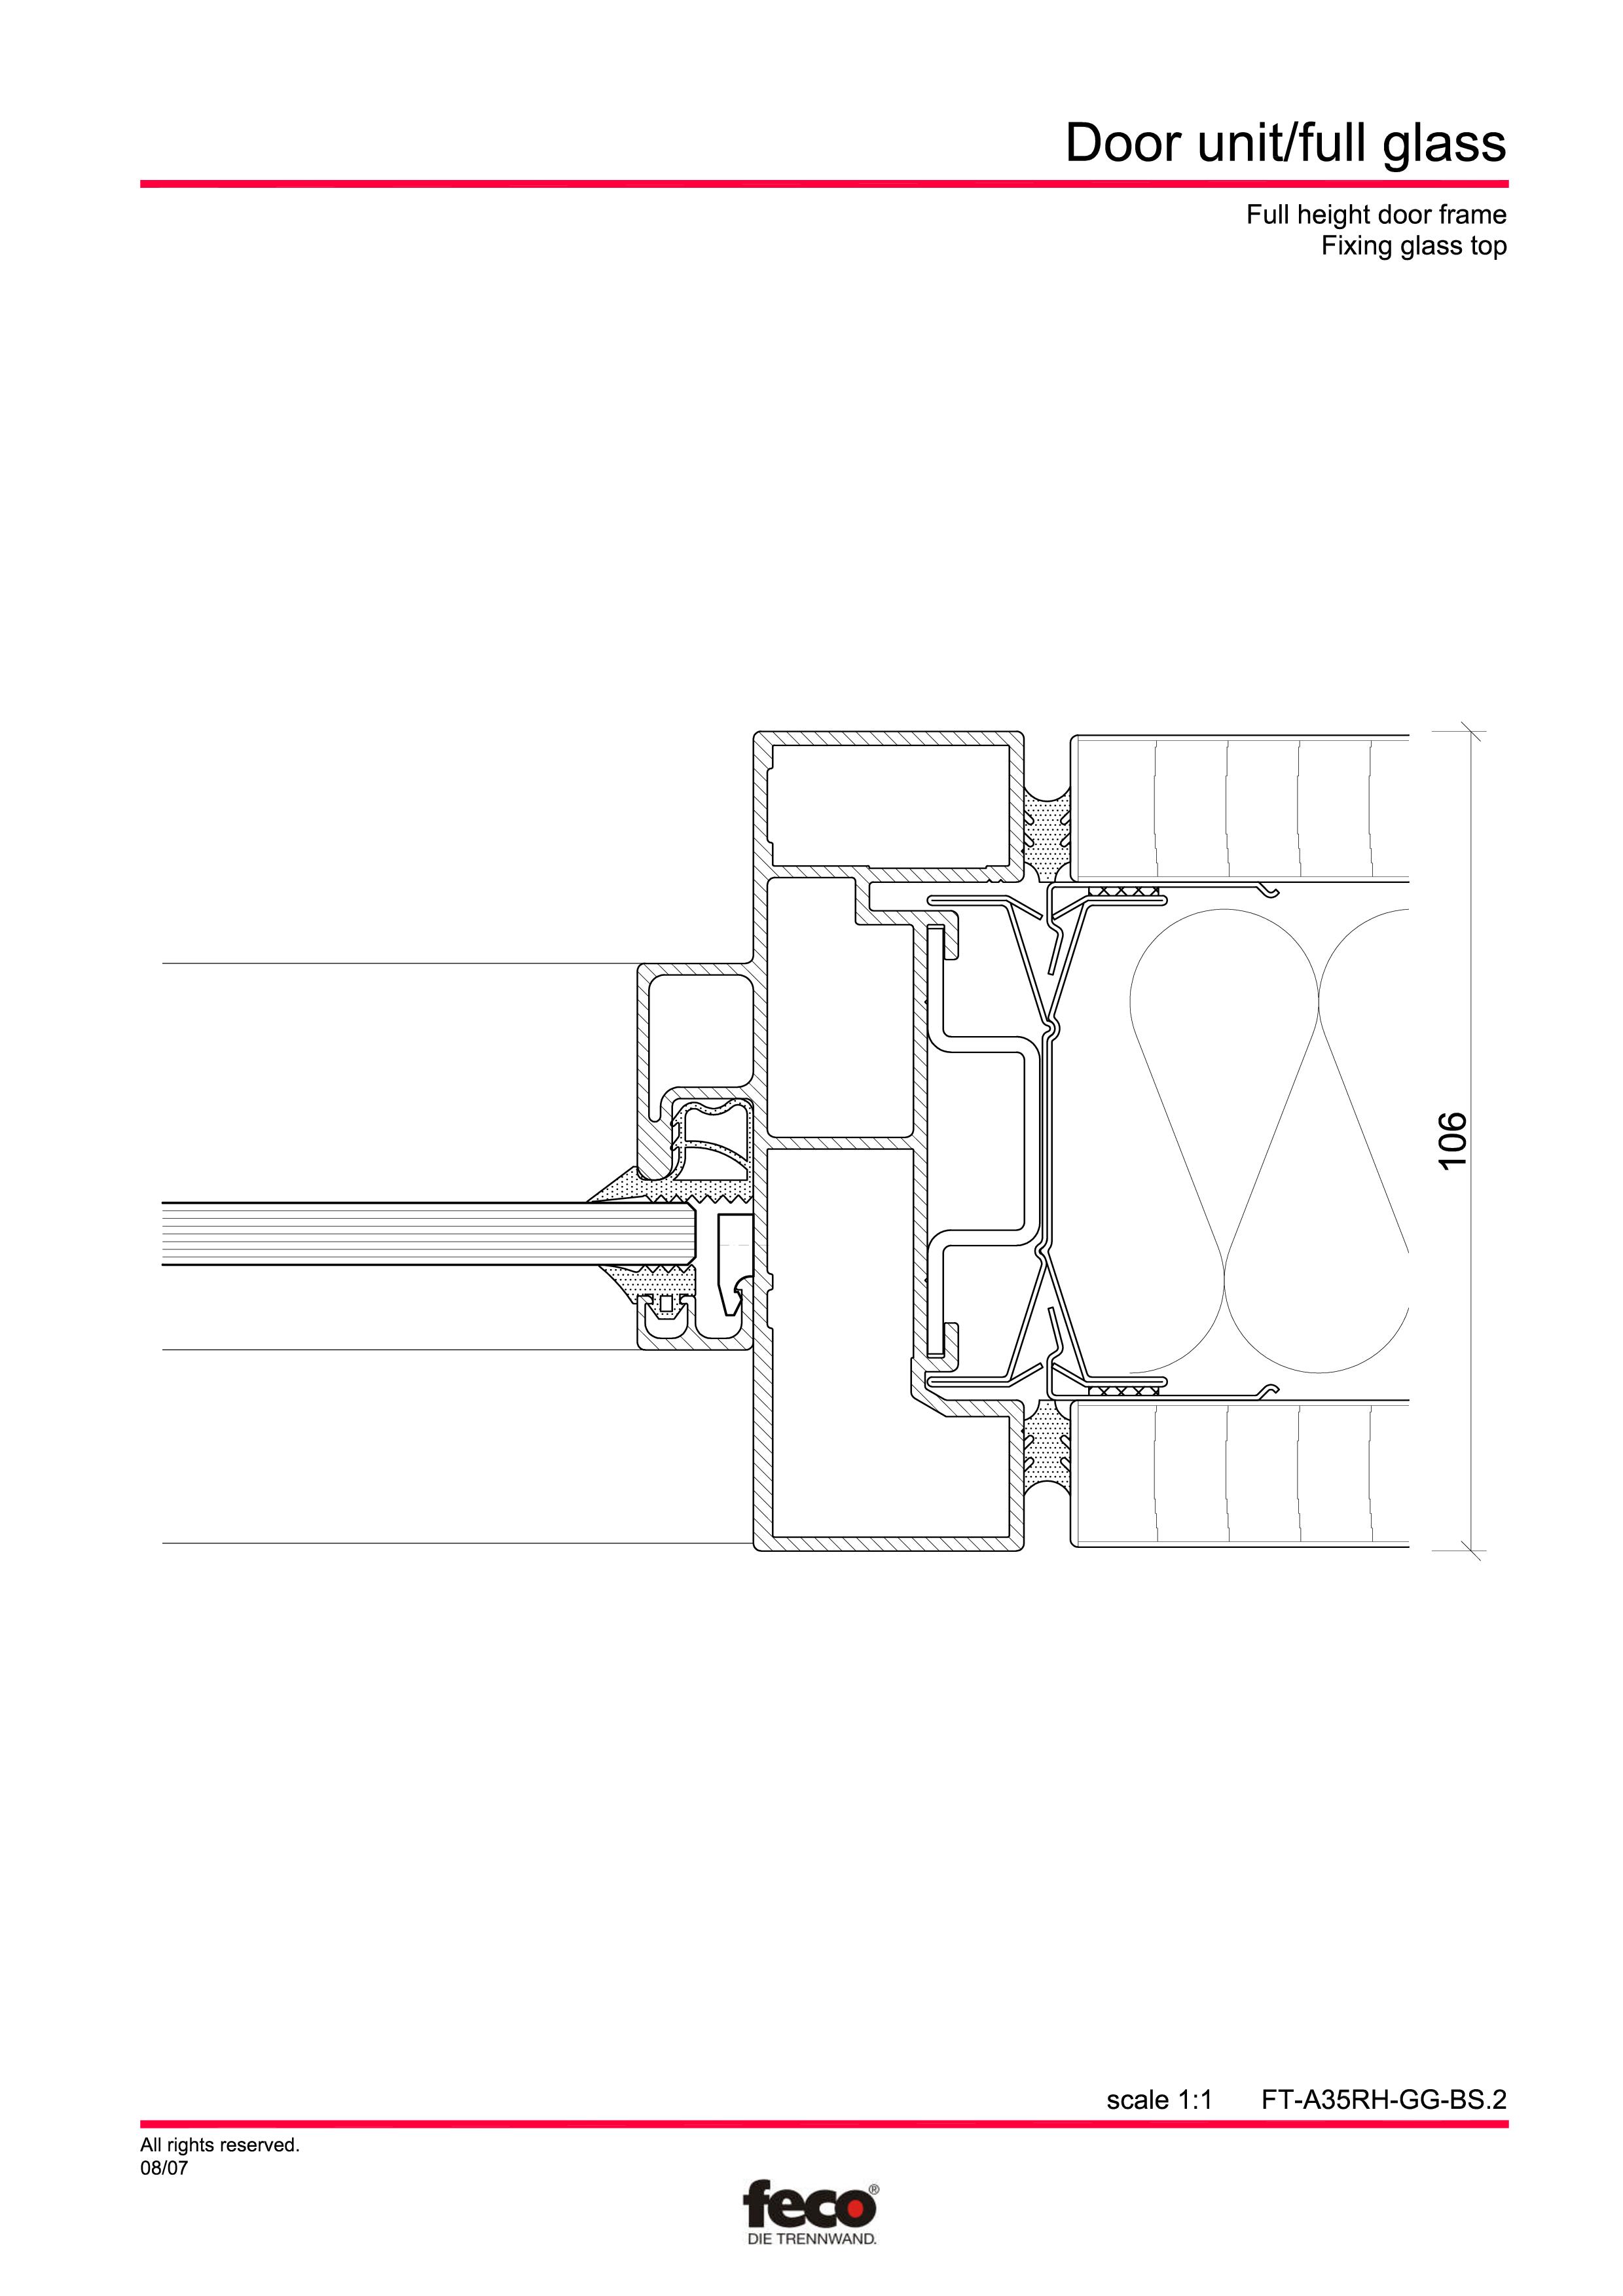 Pagina 7 - CAD-PDF Usa de sticla (pana la planseu) FECO Detaliu de montaj